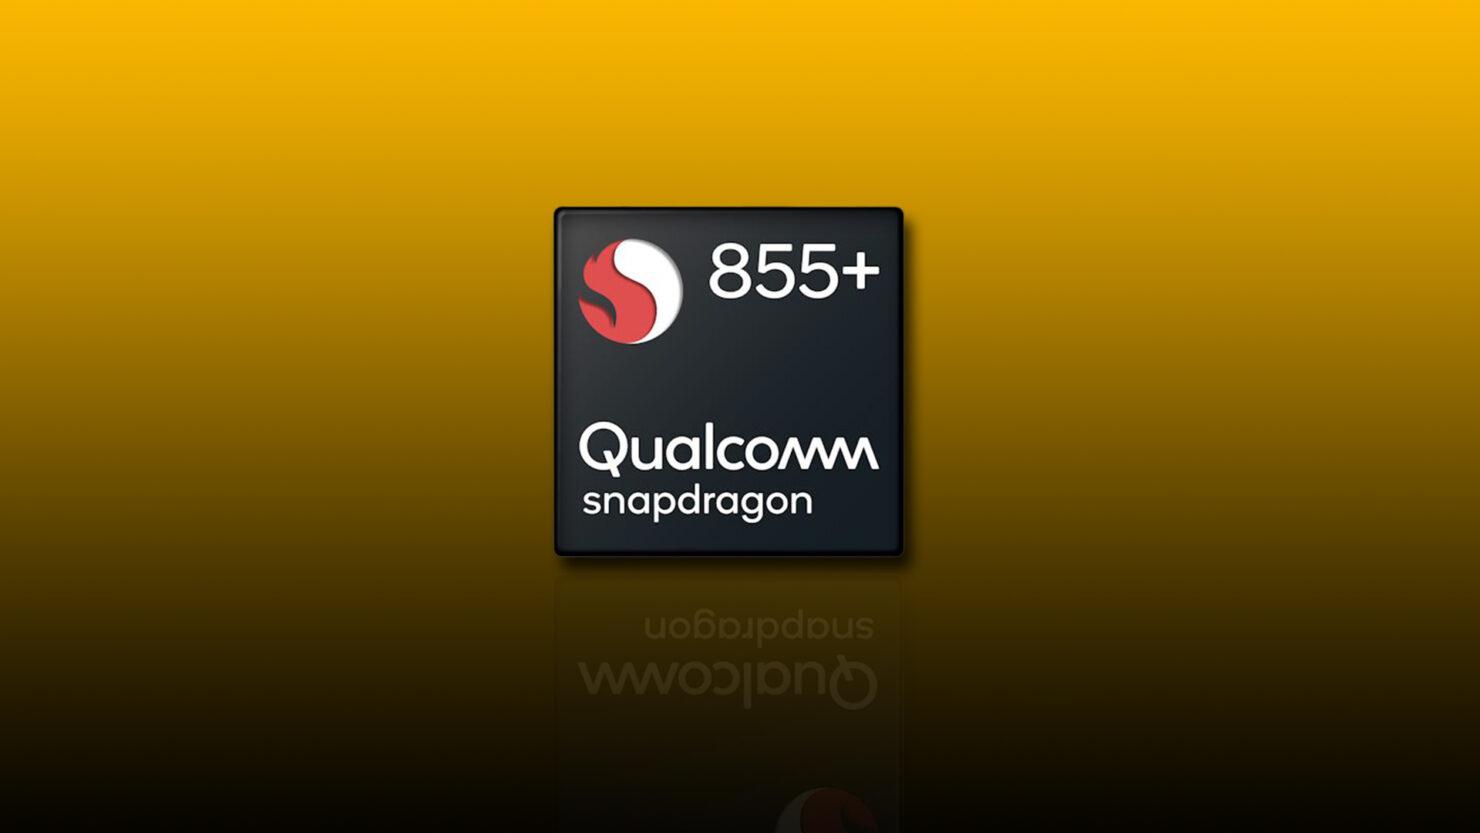 No Snapdragon 855 Plus for Pixel 4, Pixel 4 XL